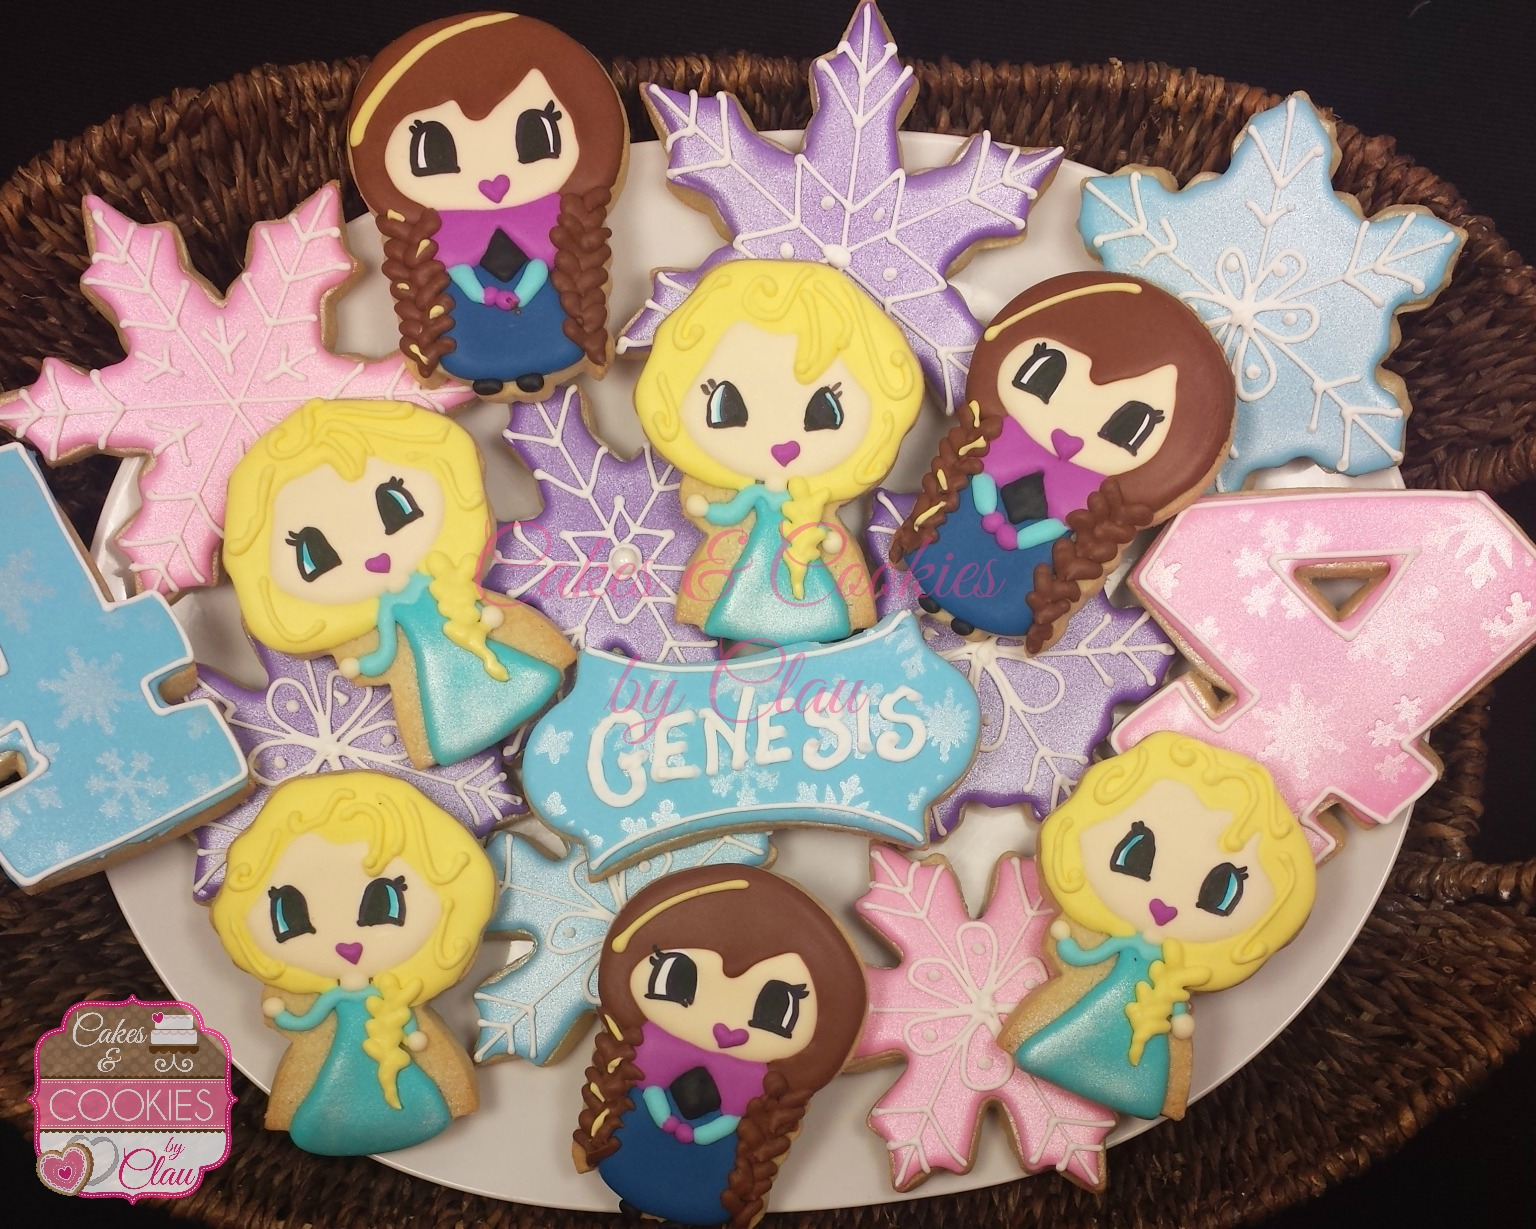 Frozen - Genesis.jpg